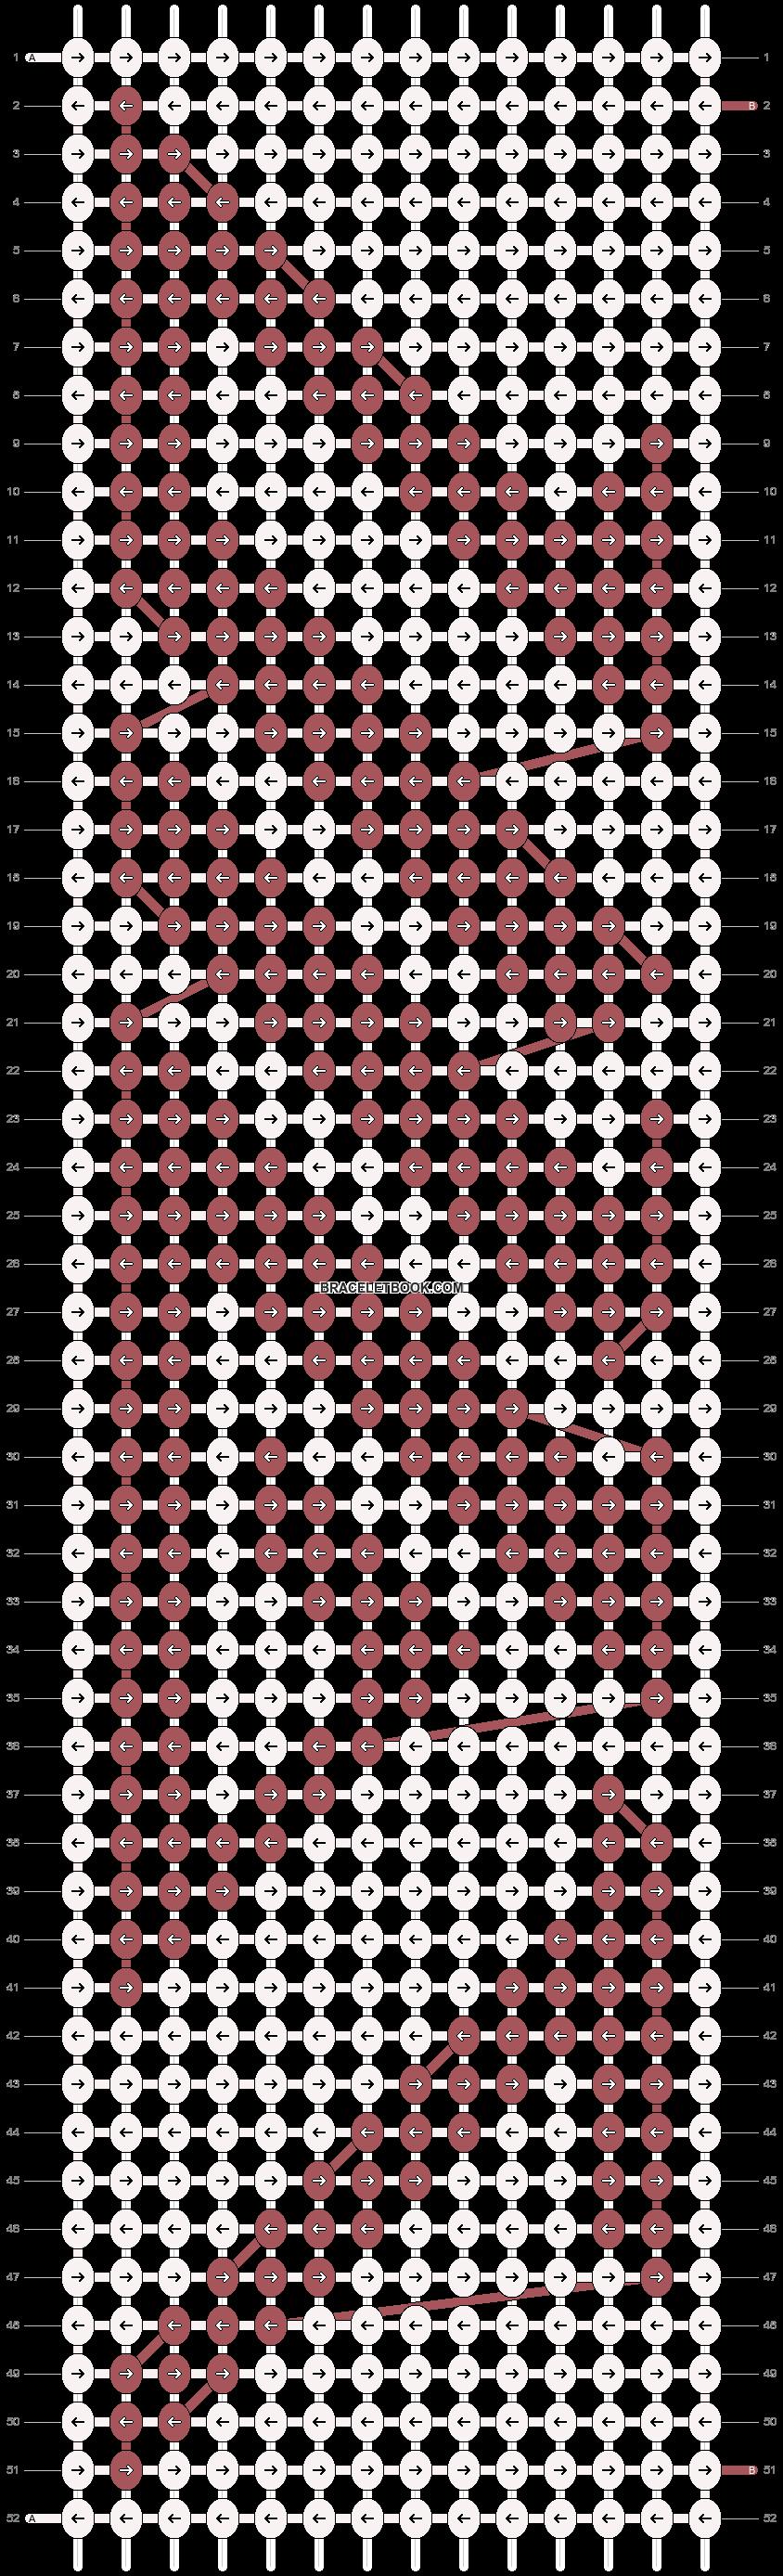 Alpha pattern #52889 pattern